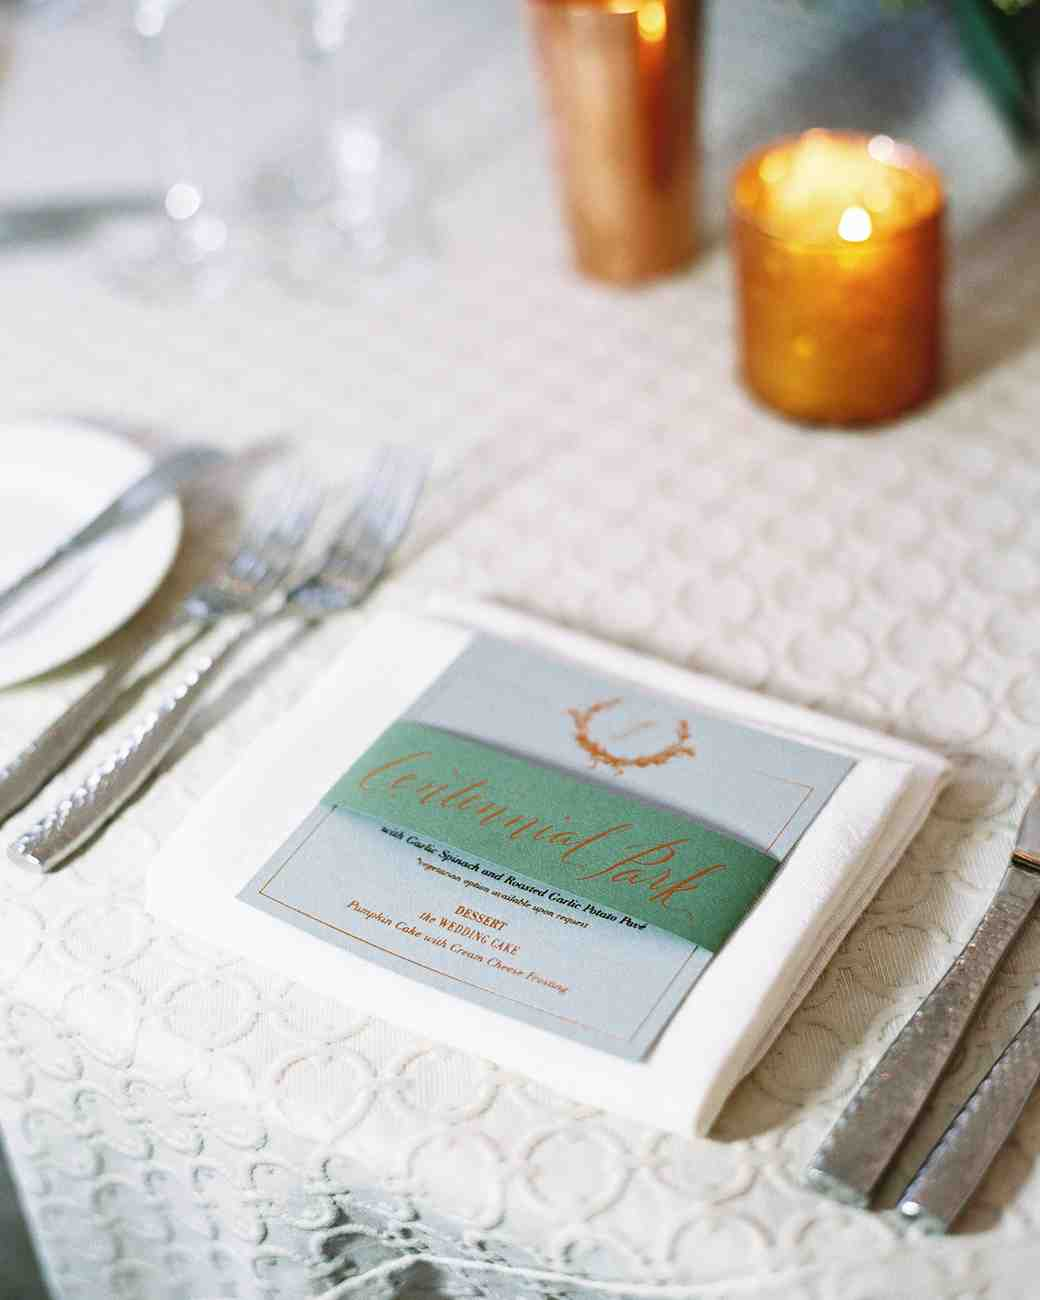 taylor-john-wedding-placesetting-84-s113035-0616.jpg